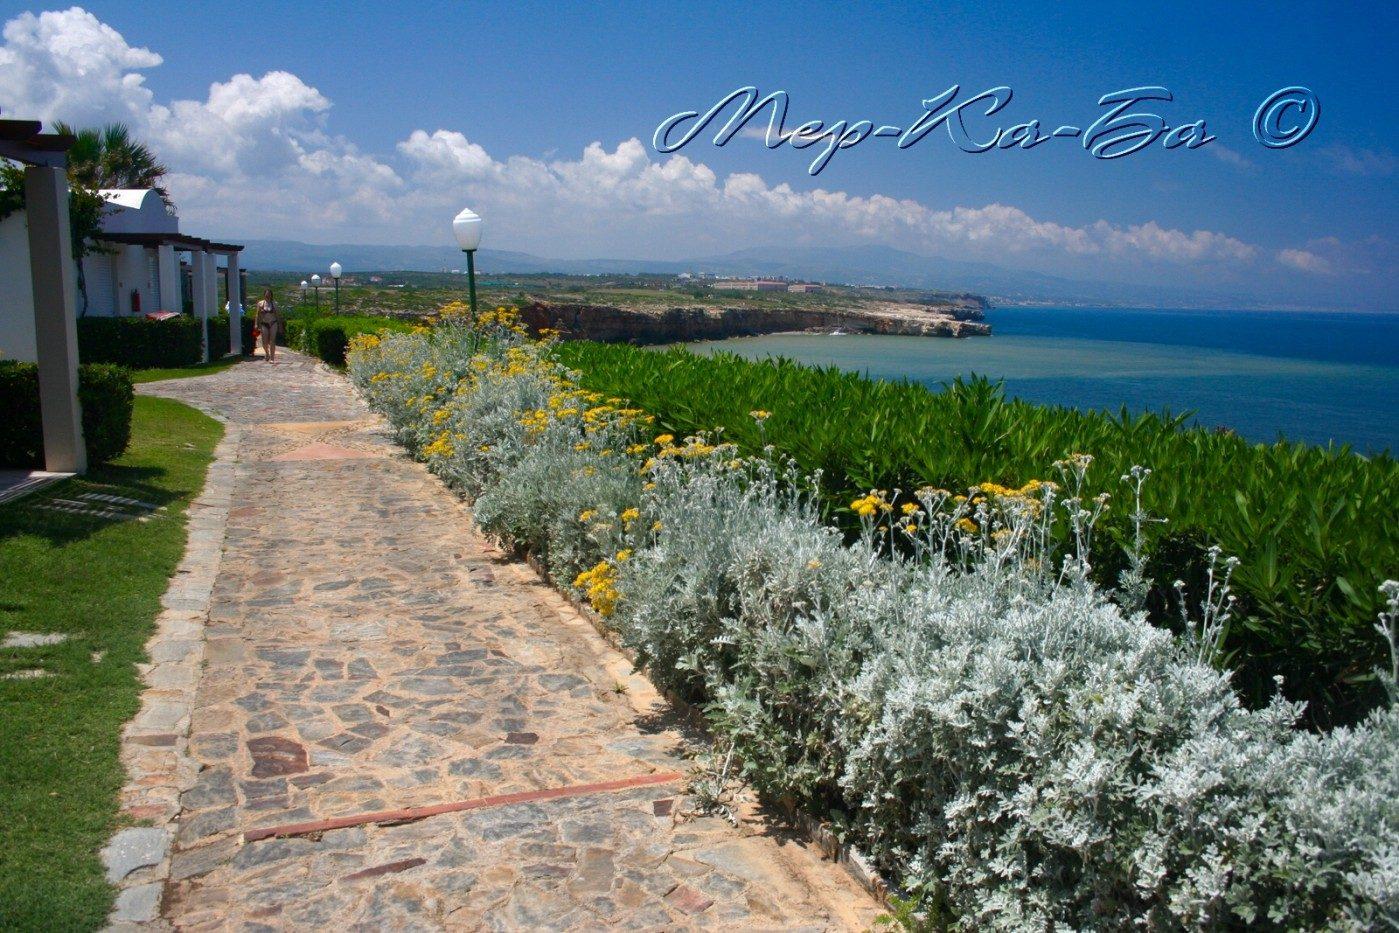 территория отеля Iberostar Creta Panorama & Mare